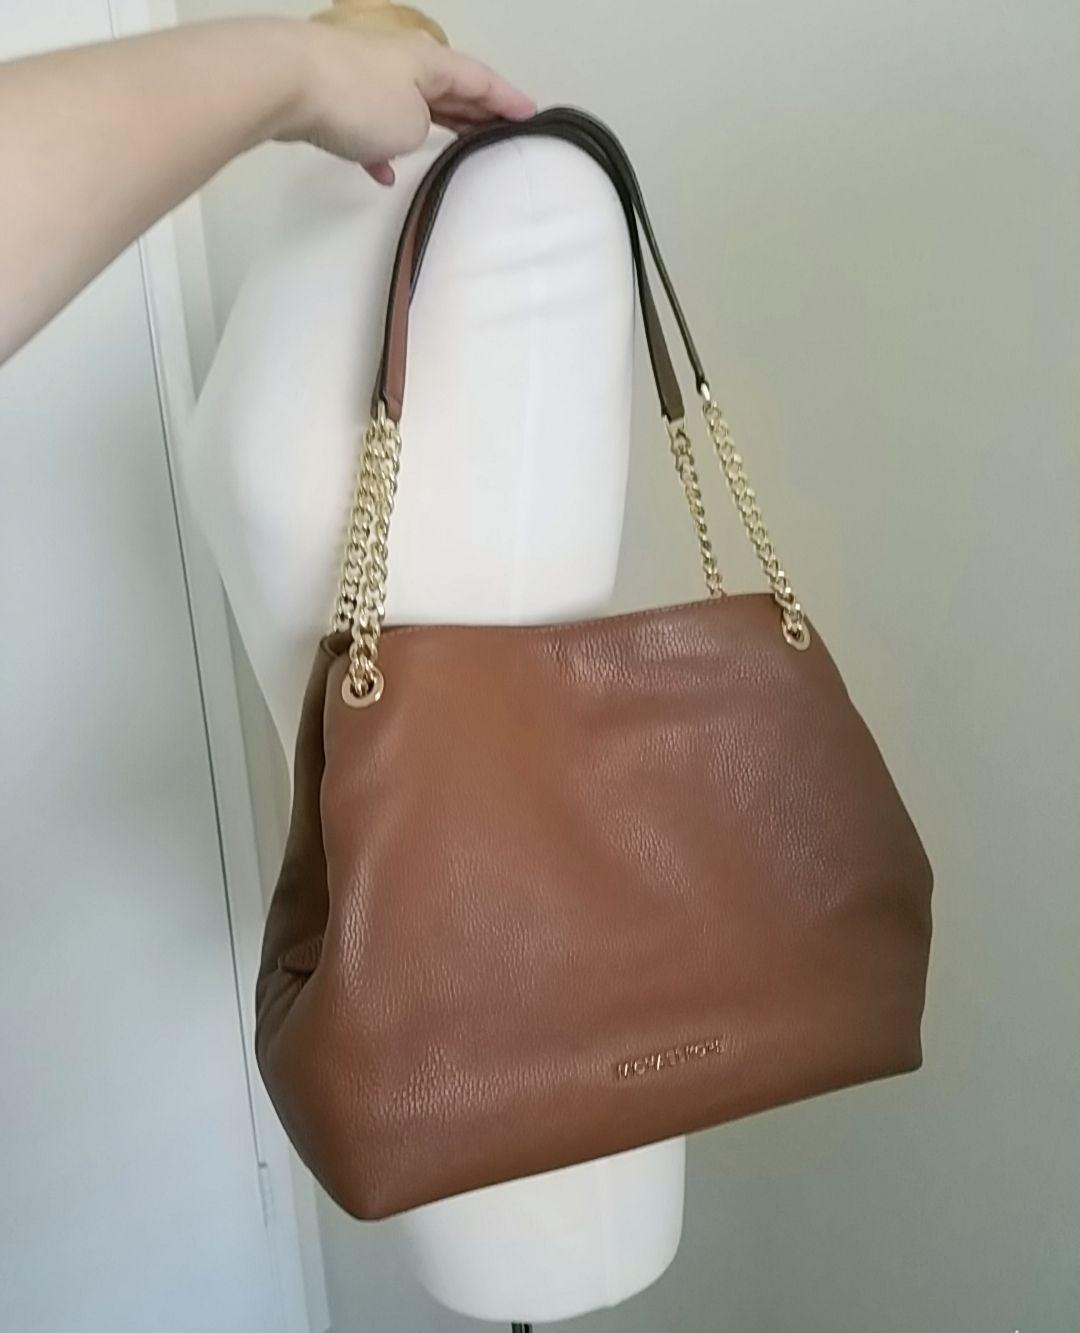 Michael Kors purse chain bag NWOT